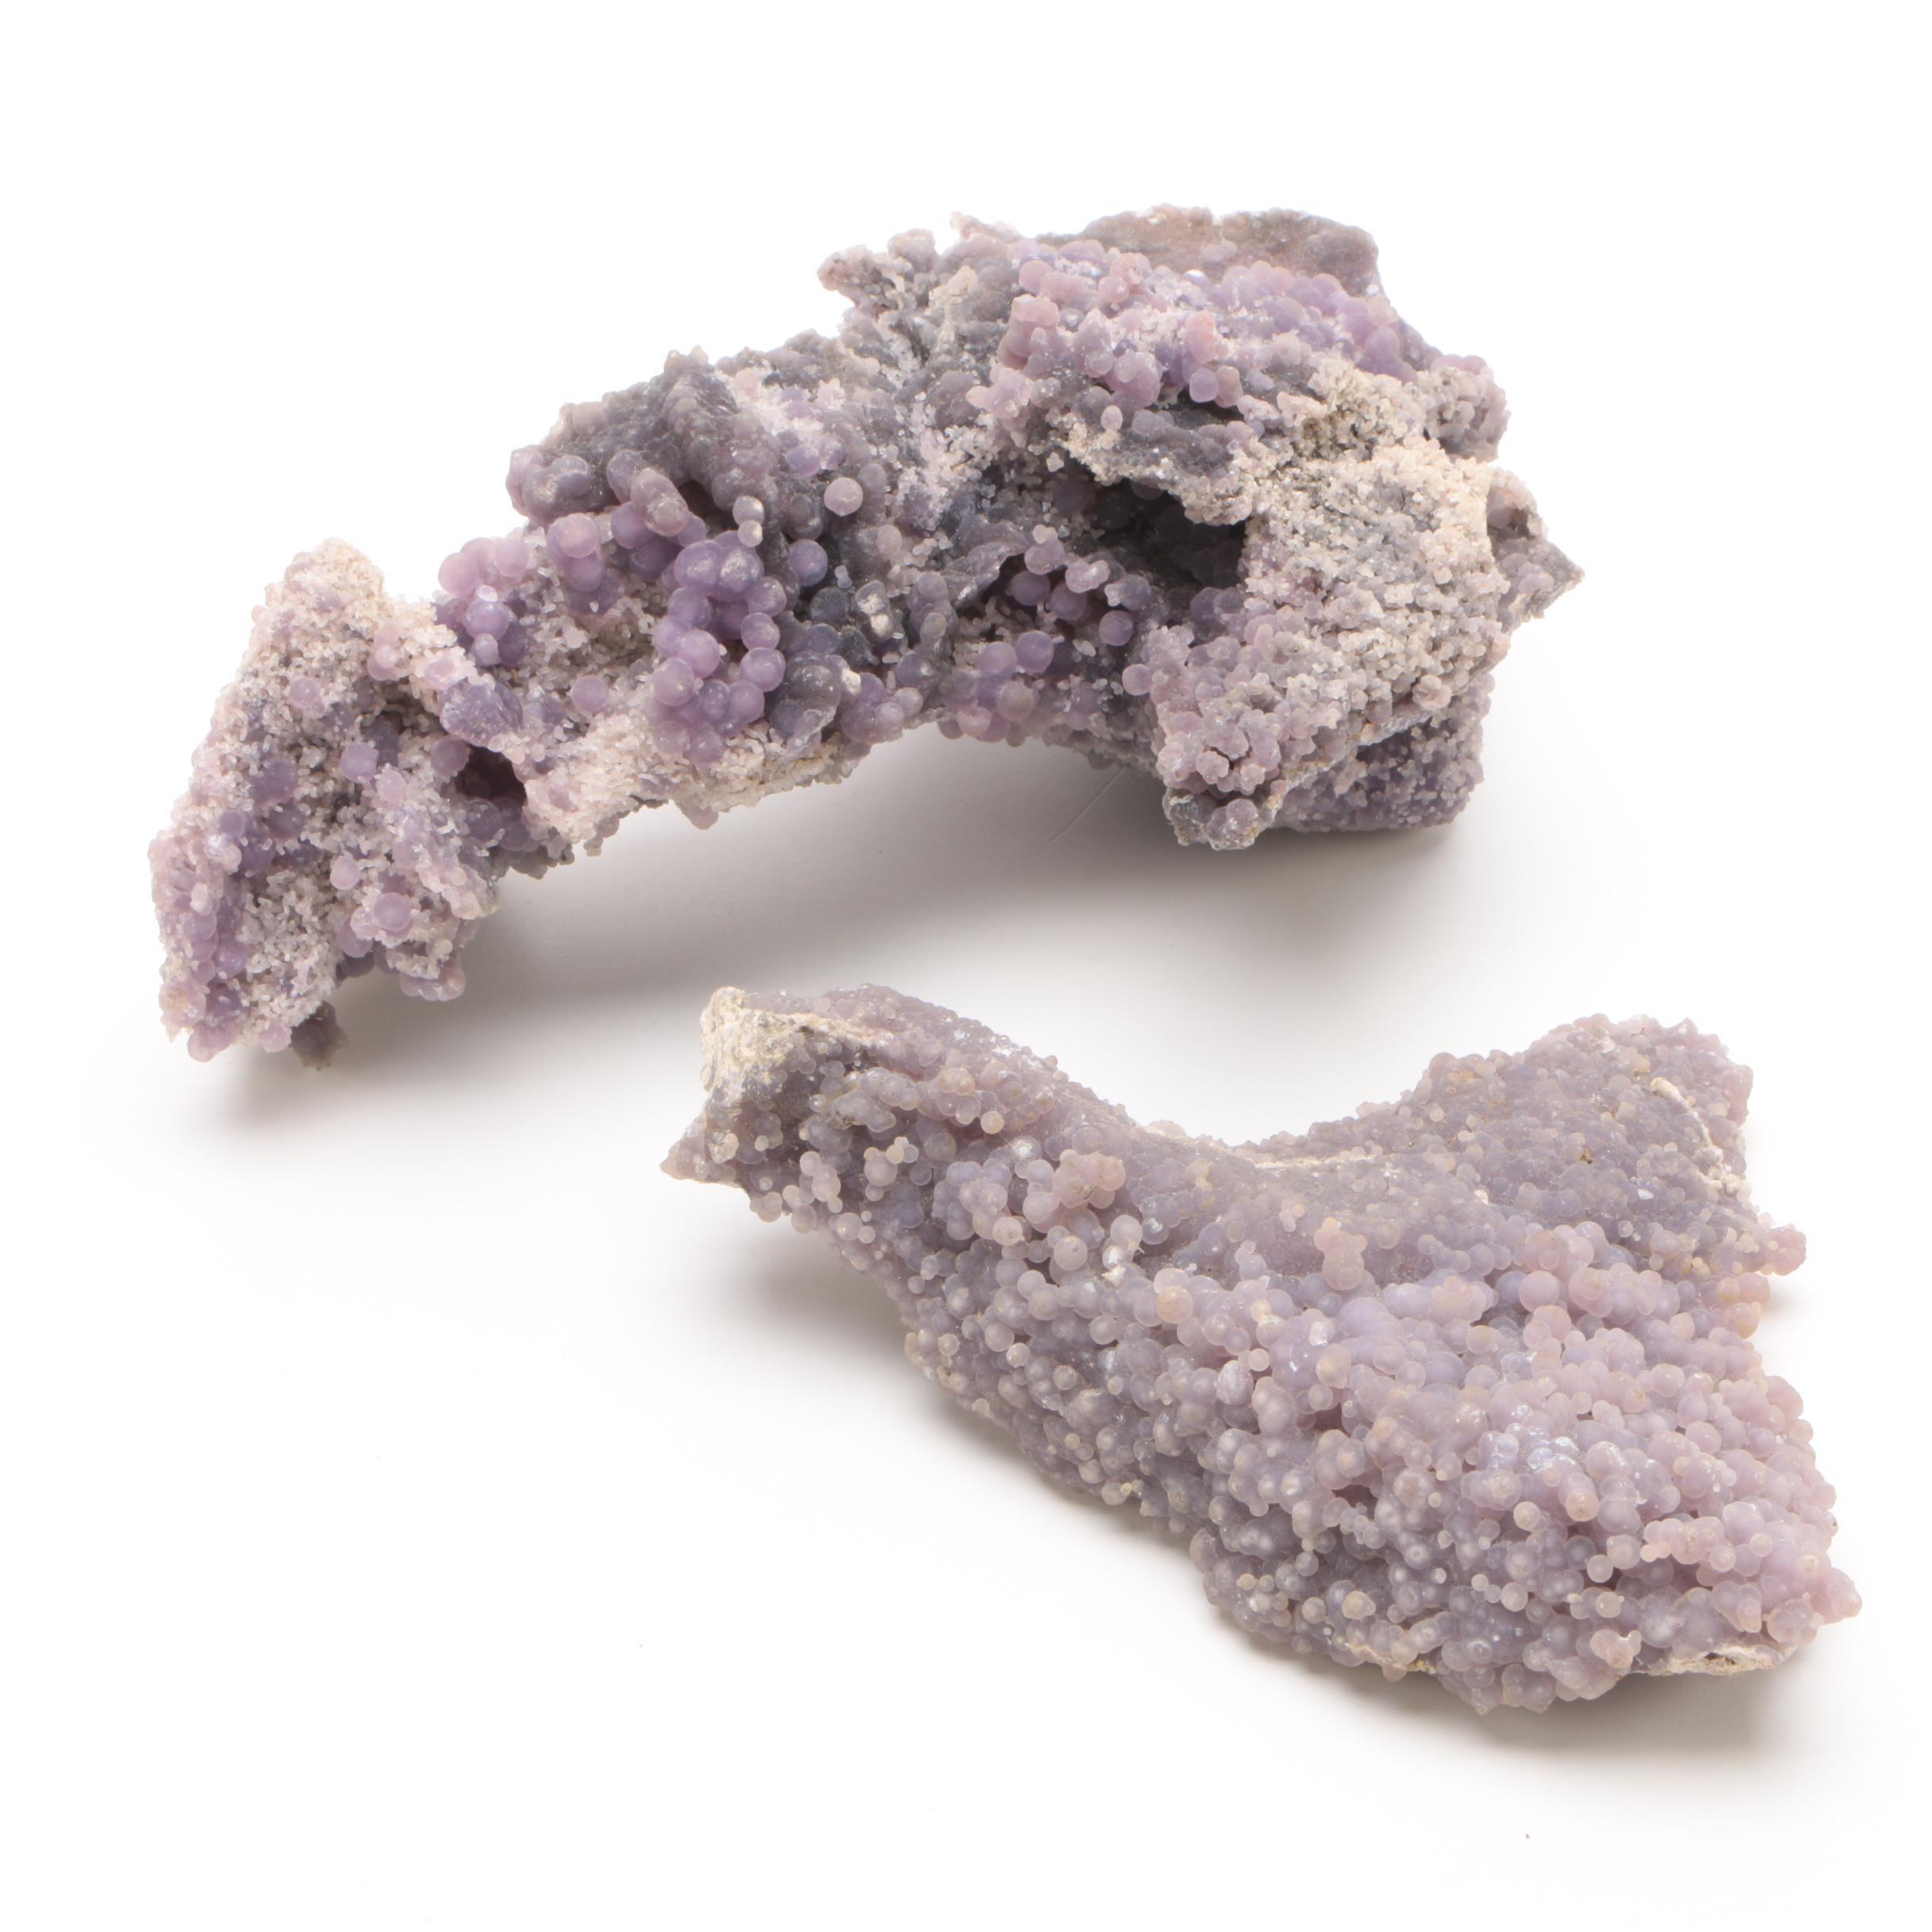 Grape Chalcedony Specimens